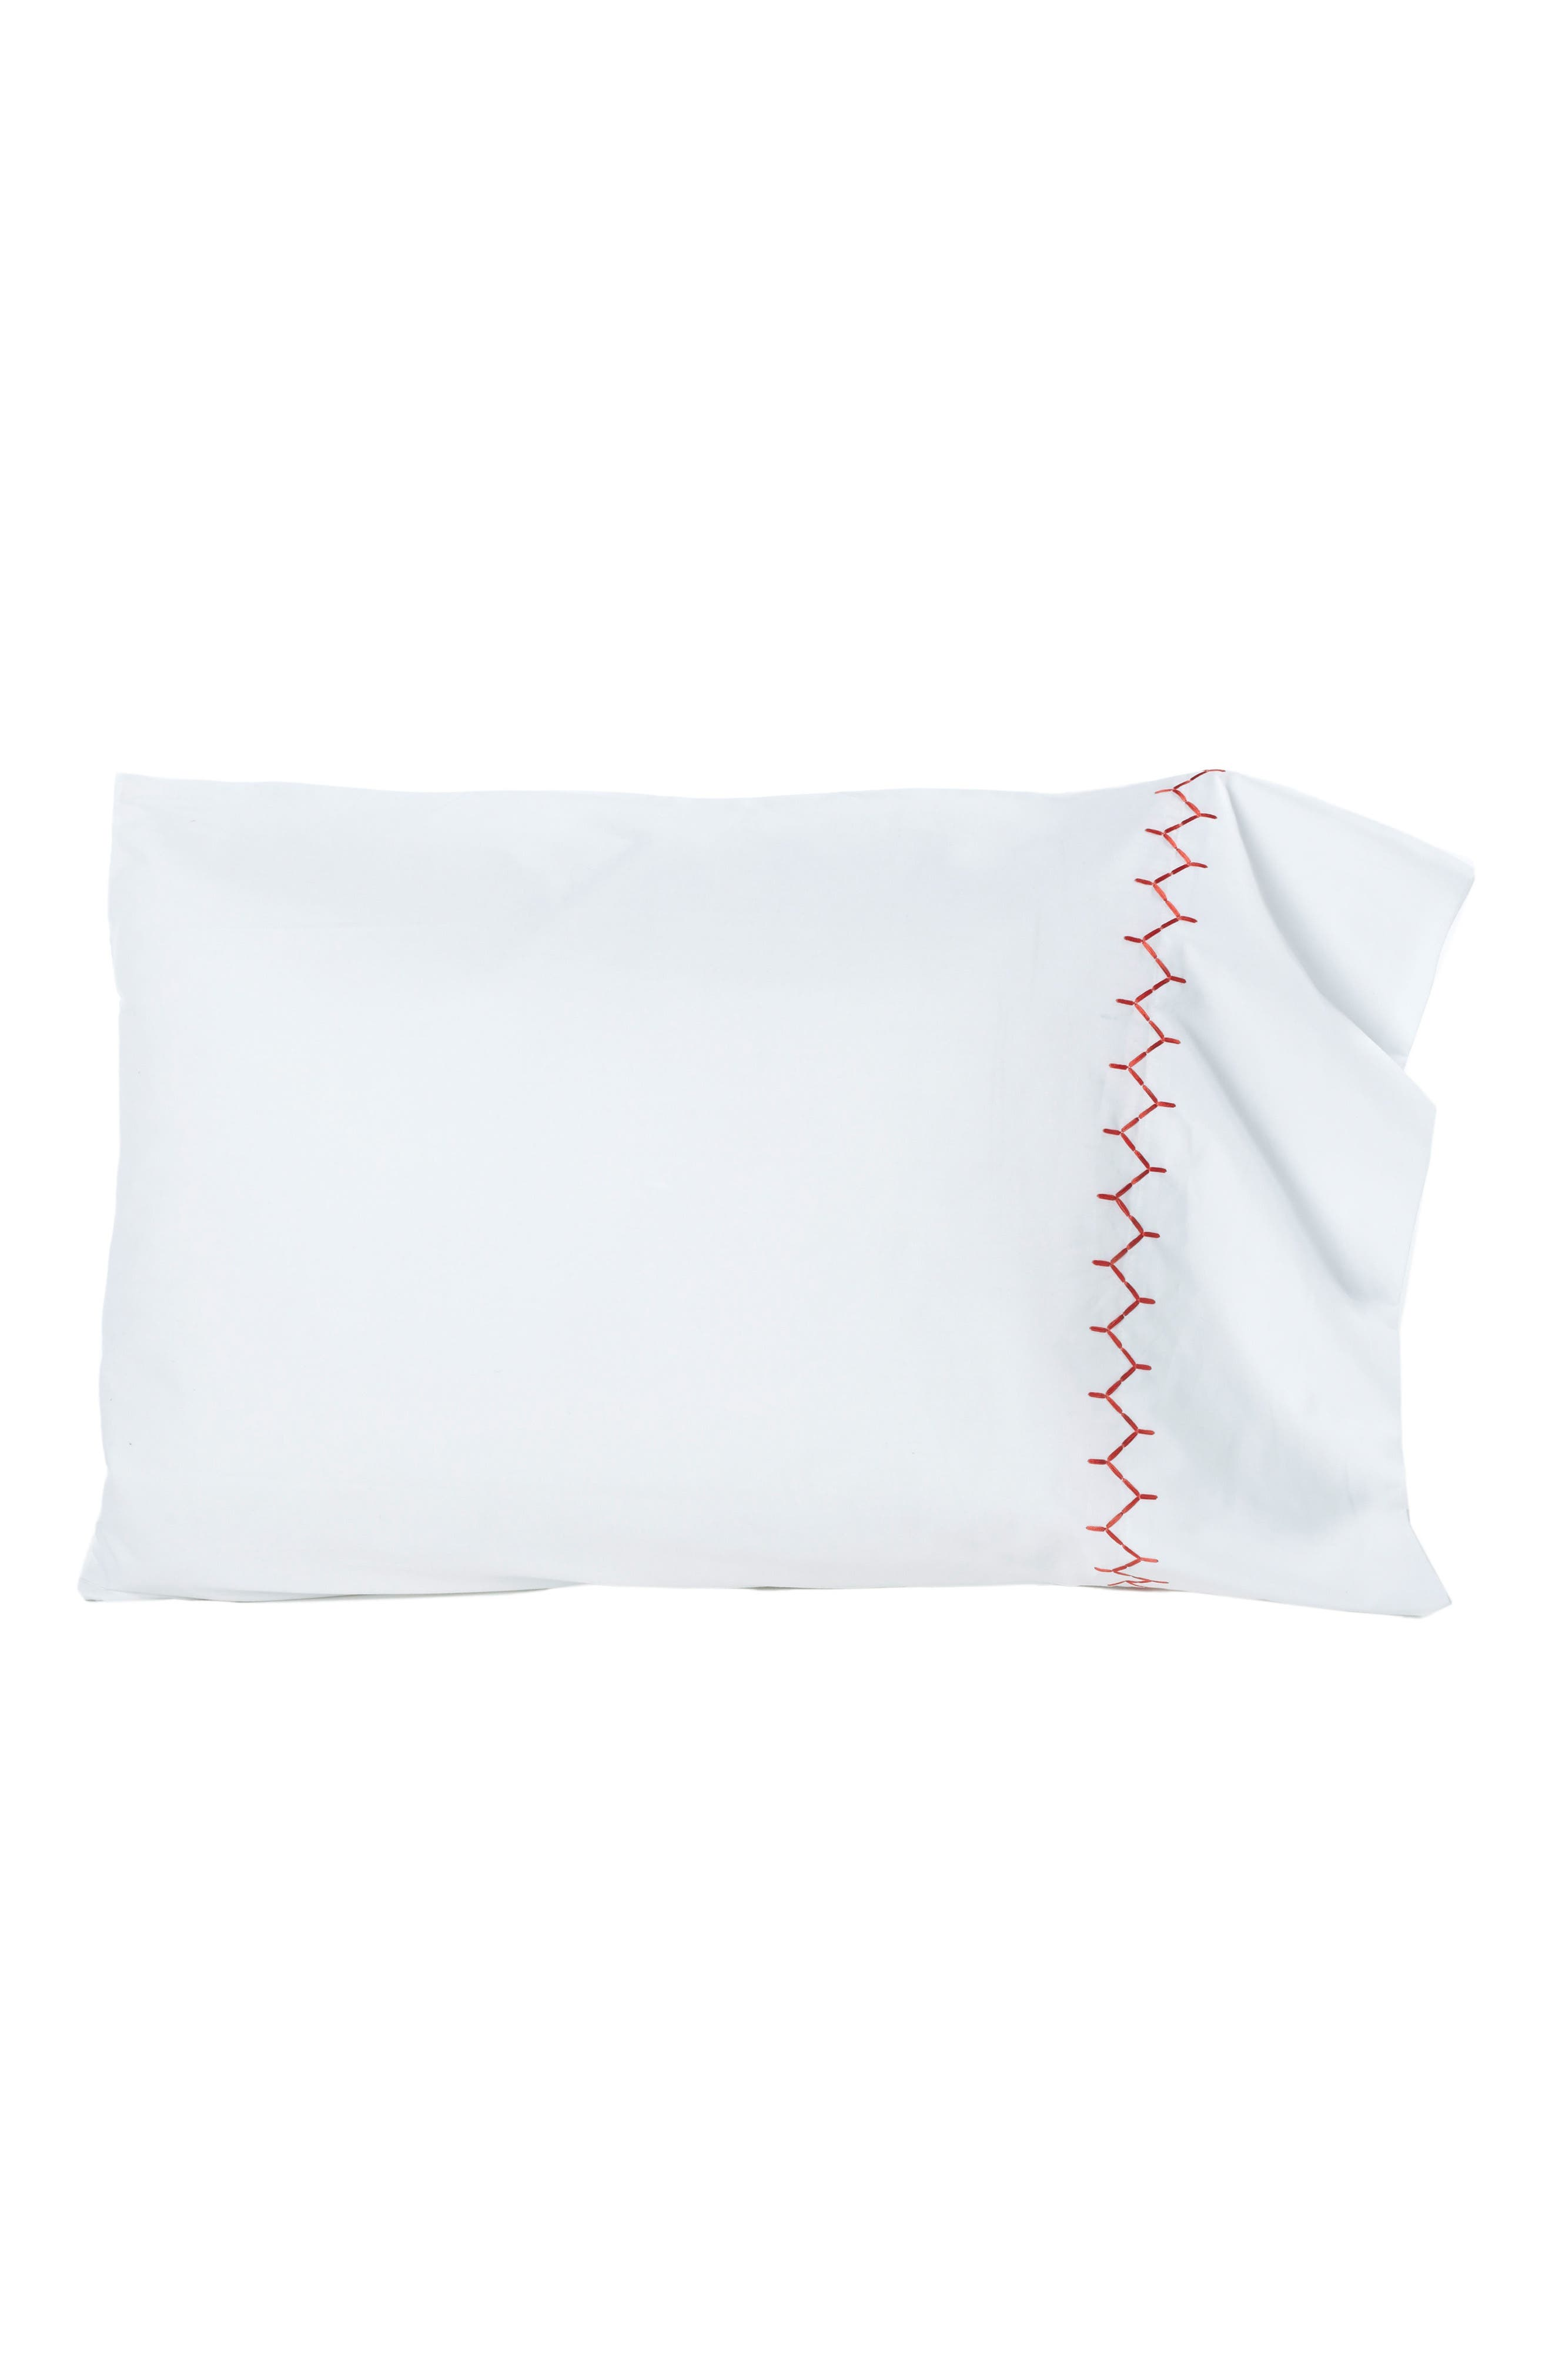 Main Image - John Robshaw Stitched Border 300 Thread Count Pillowcases